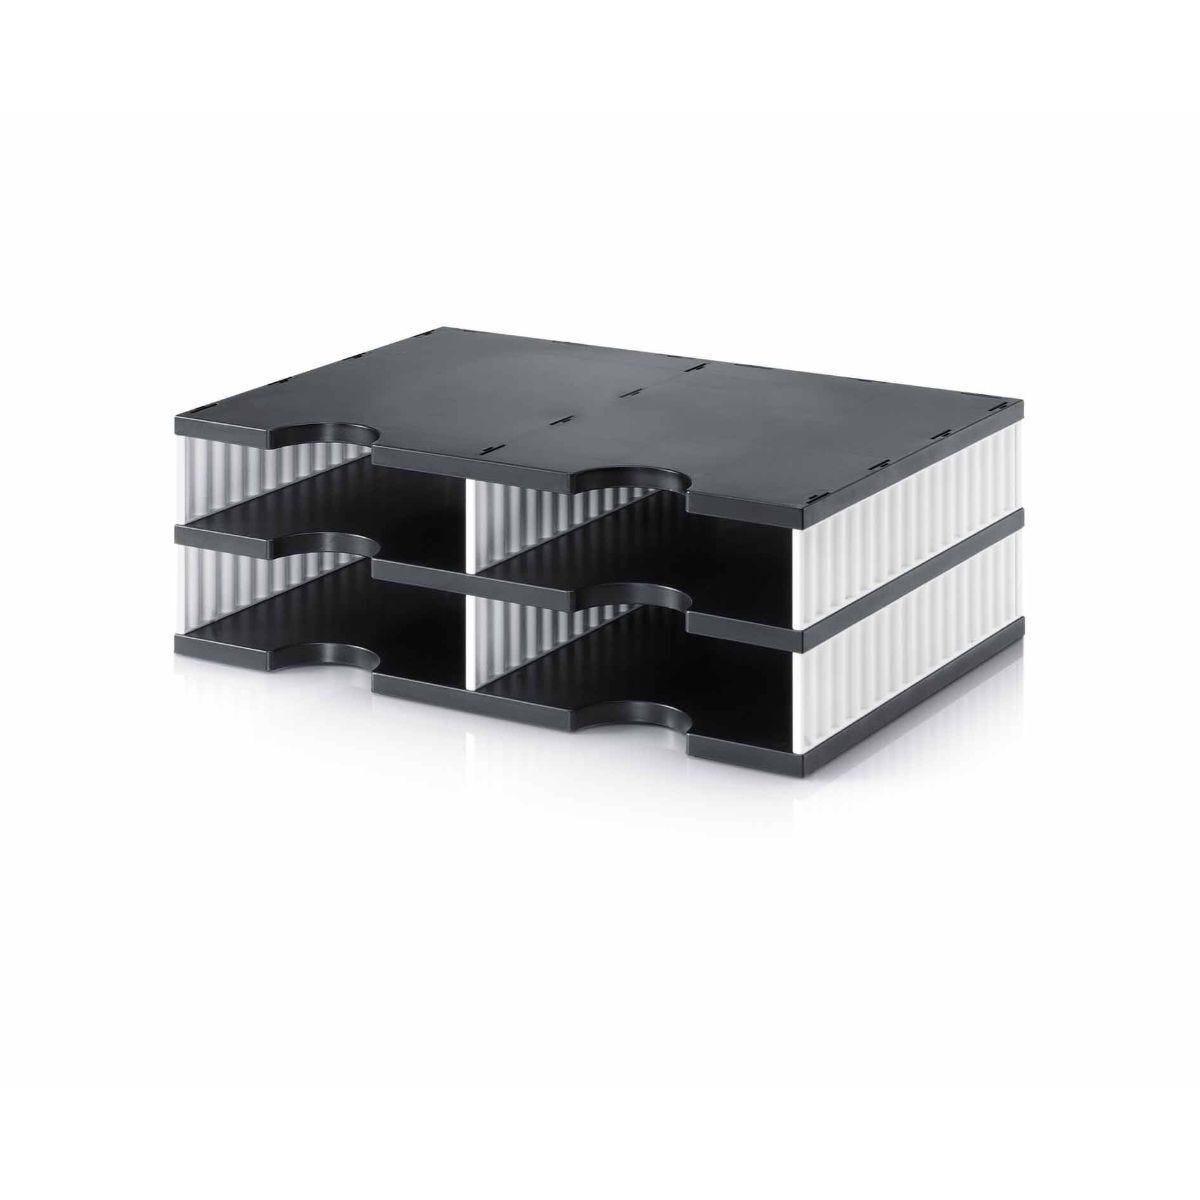 Styrodoc Duo Desktop Organiser 4 Drawer